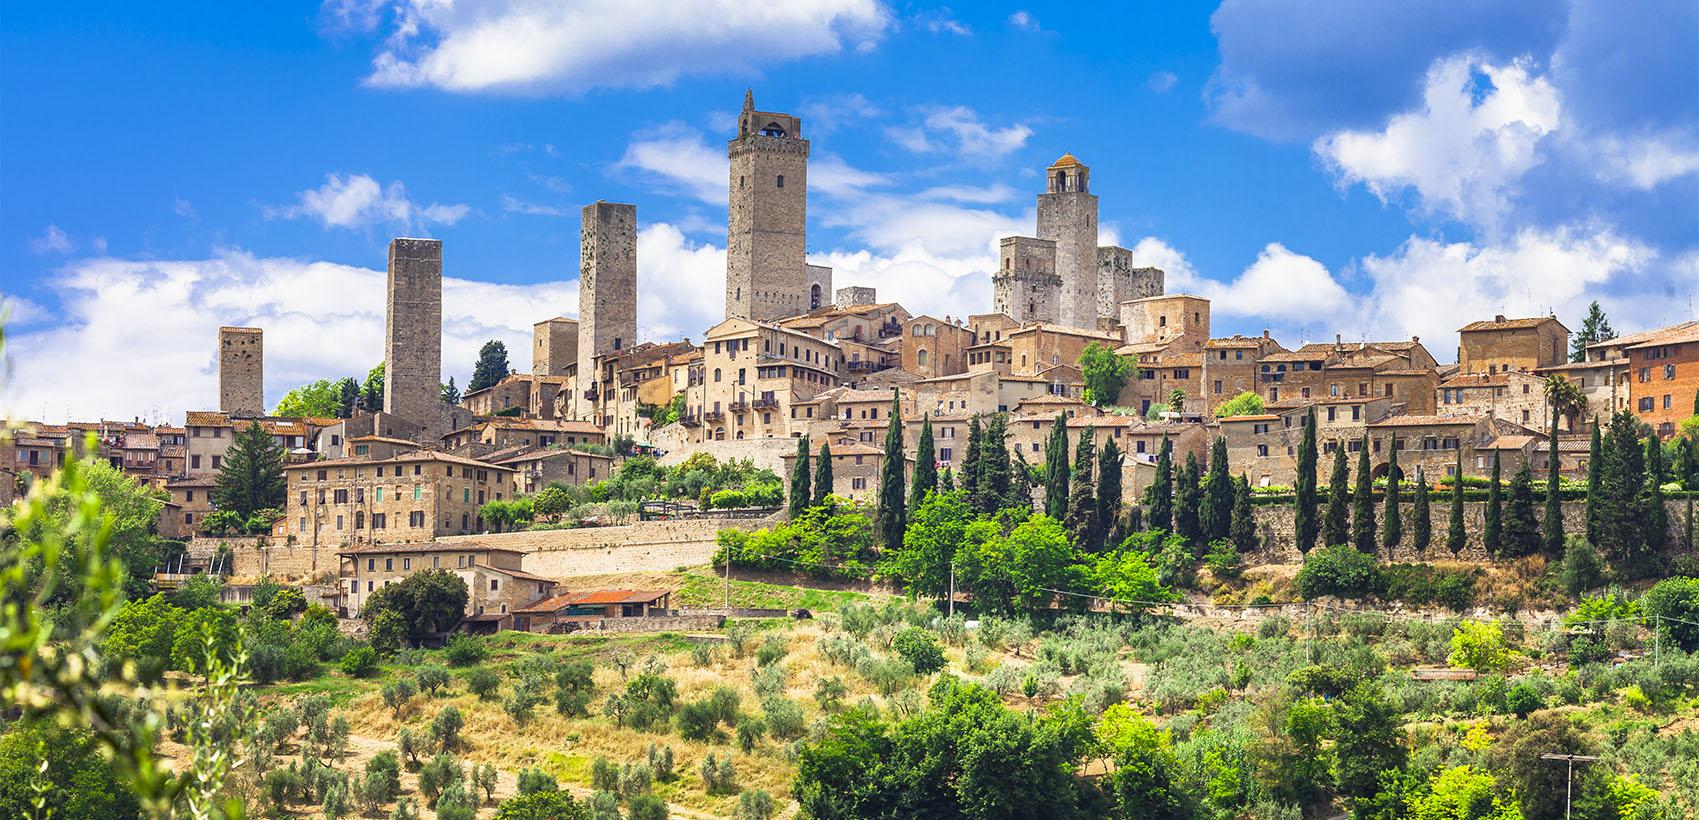 Tuscany & Cinque Terre 3